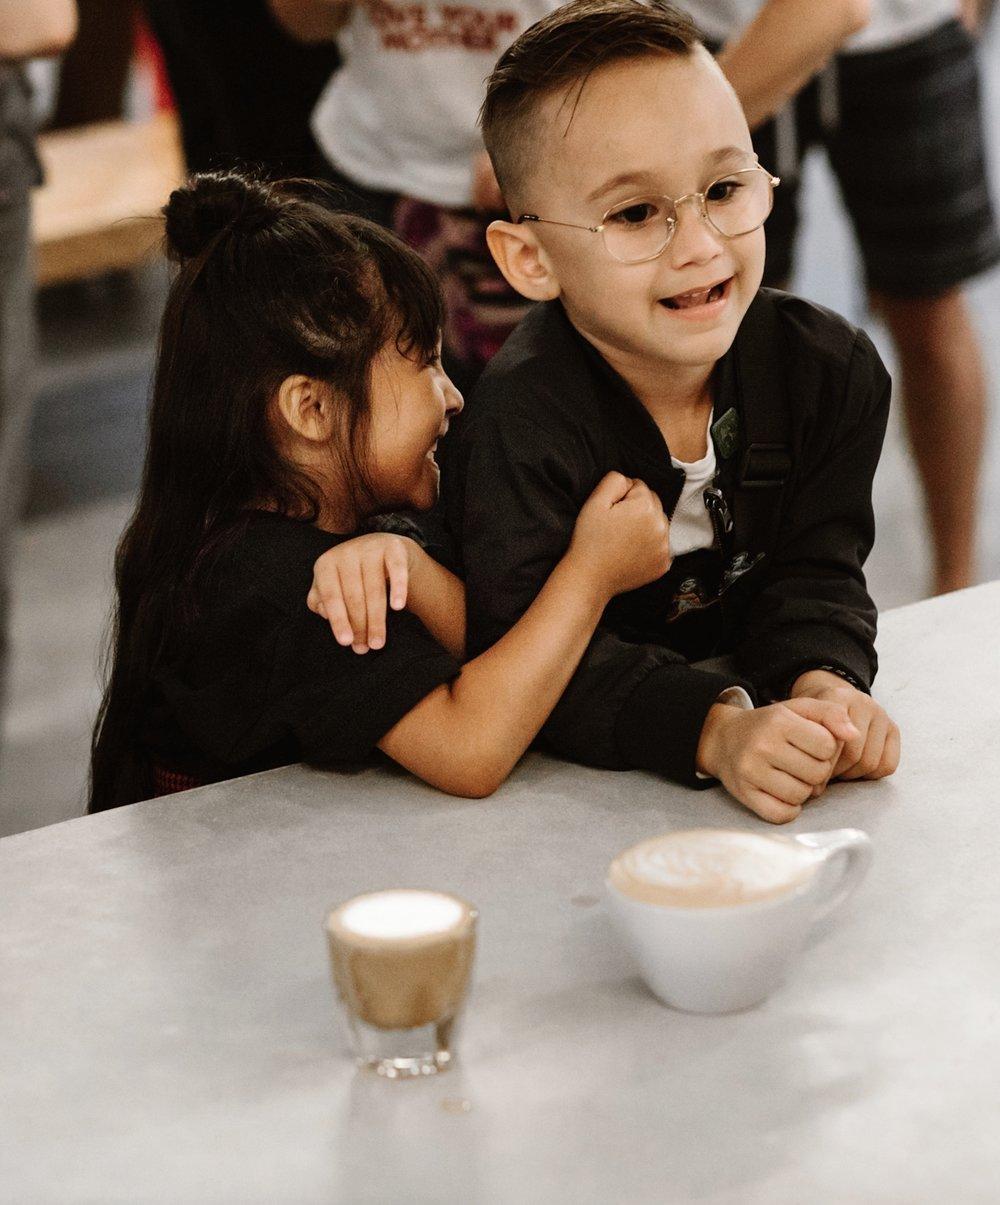 IMG_5944Penny Brave Pop up | Bad Boy Papi | Deeply Coffee | Latte Art Throwdown | Orlando Florida | Lucas Boy | Photographed by Vanessa Boy.jpg